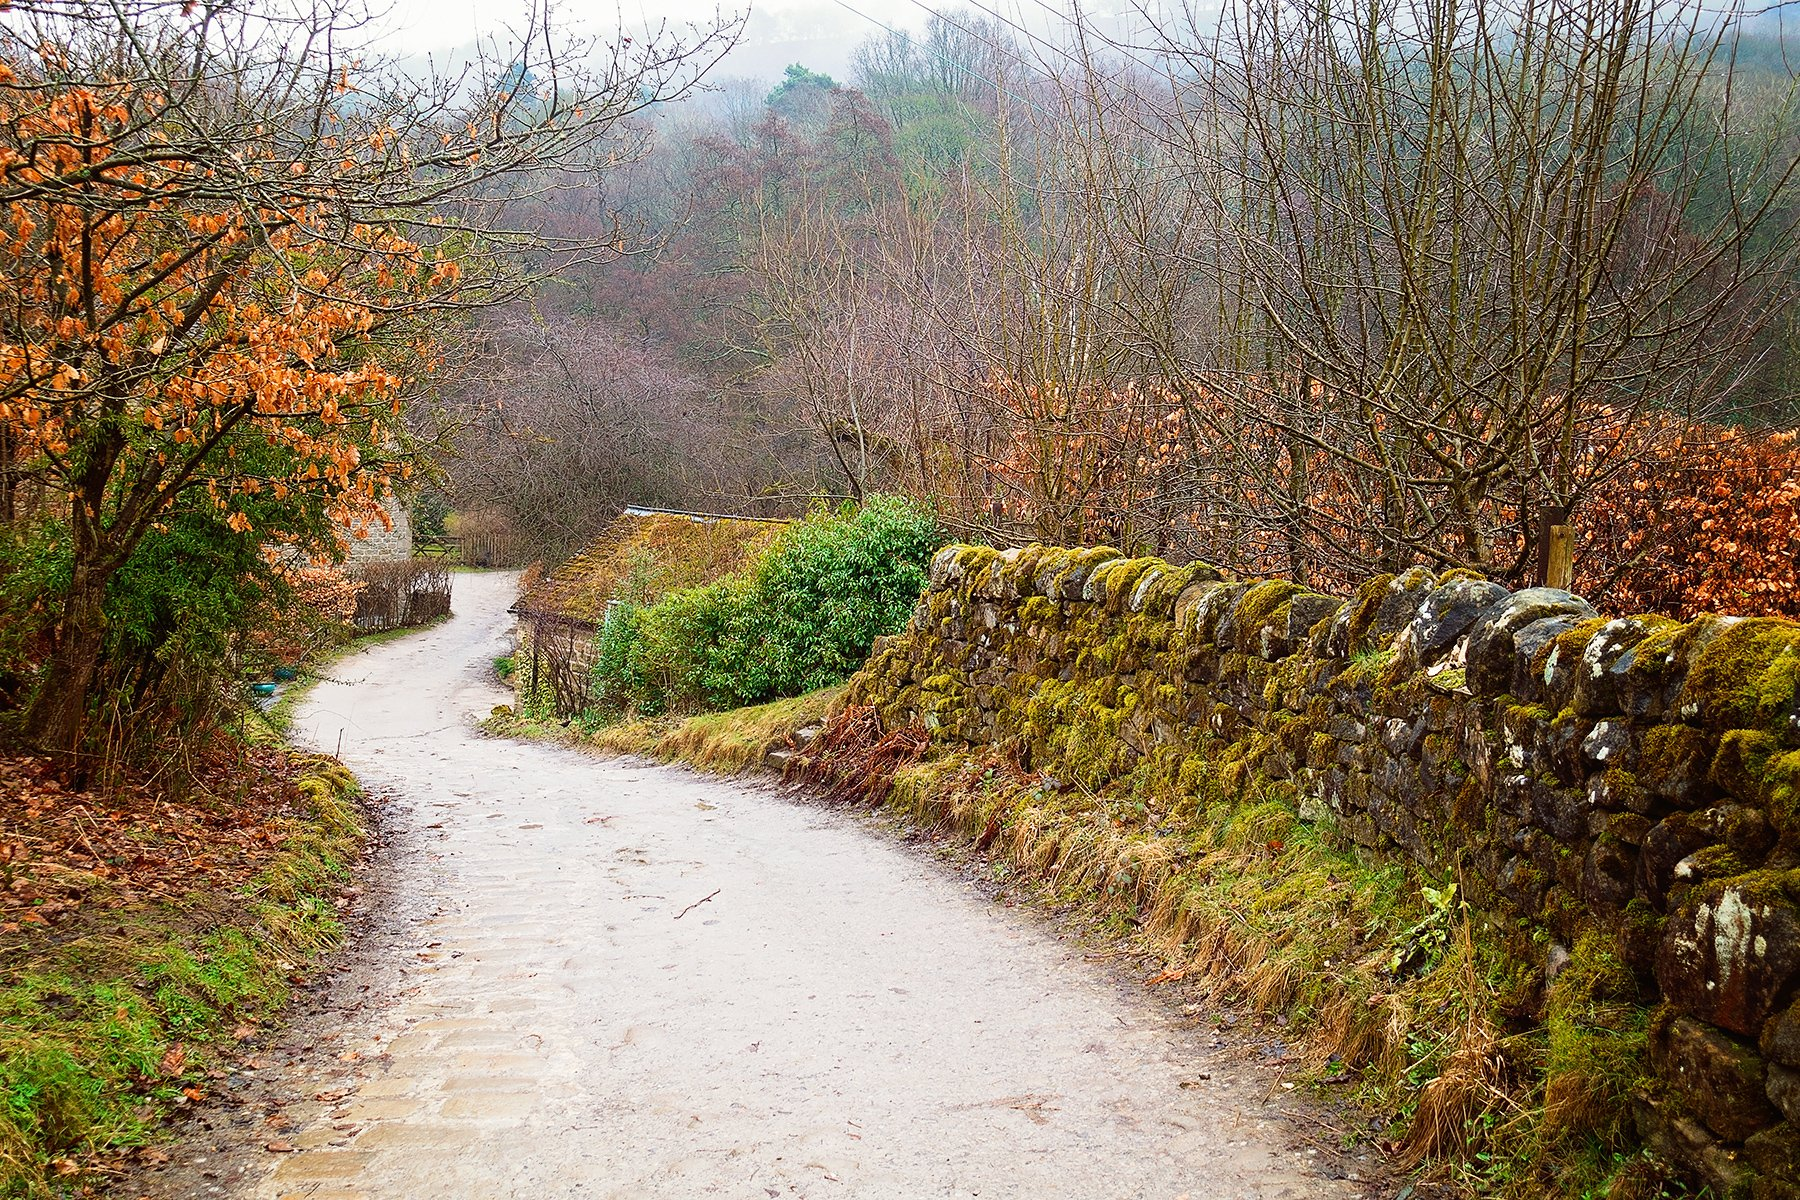 Padley Gorge walk in the Peak District